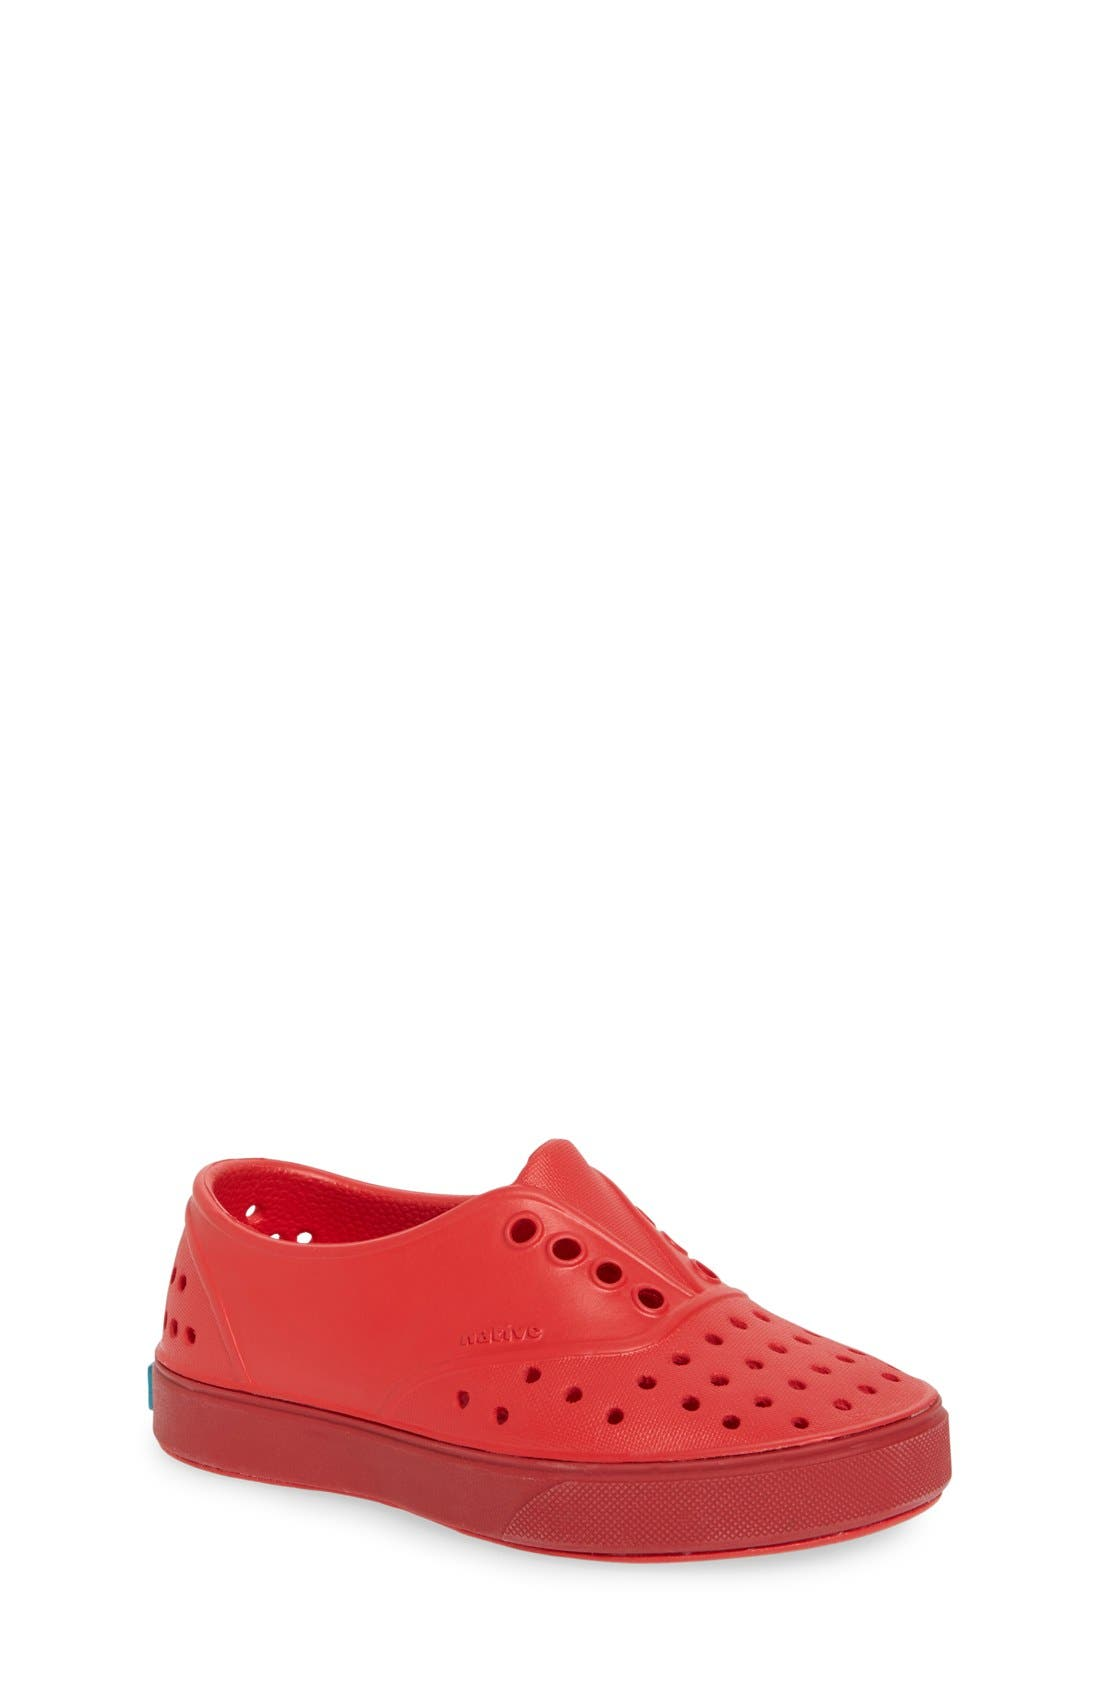 Miller Water Friendly Slip-On Sneaker,                             Main thumbnail 23, color,